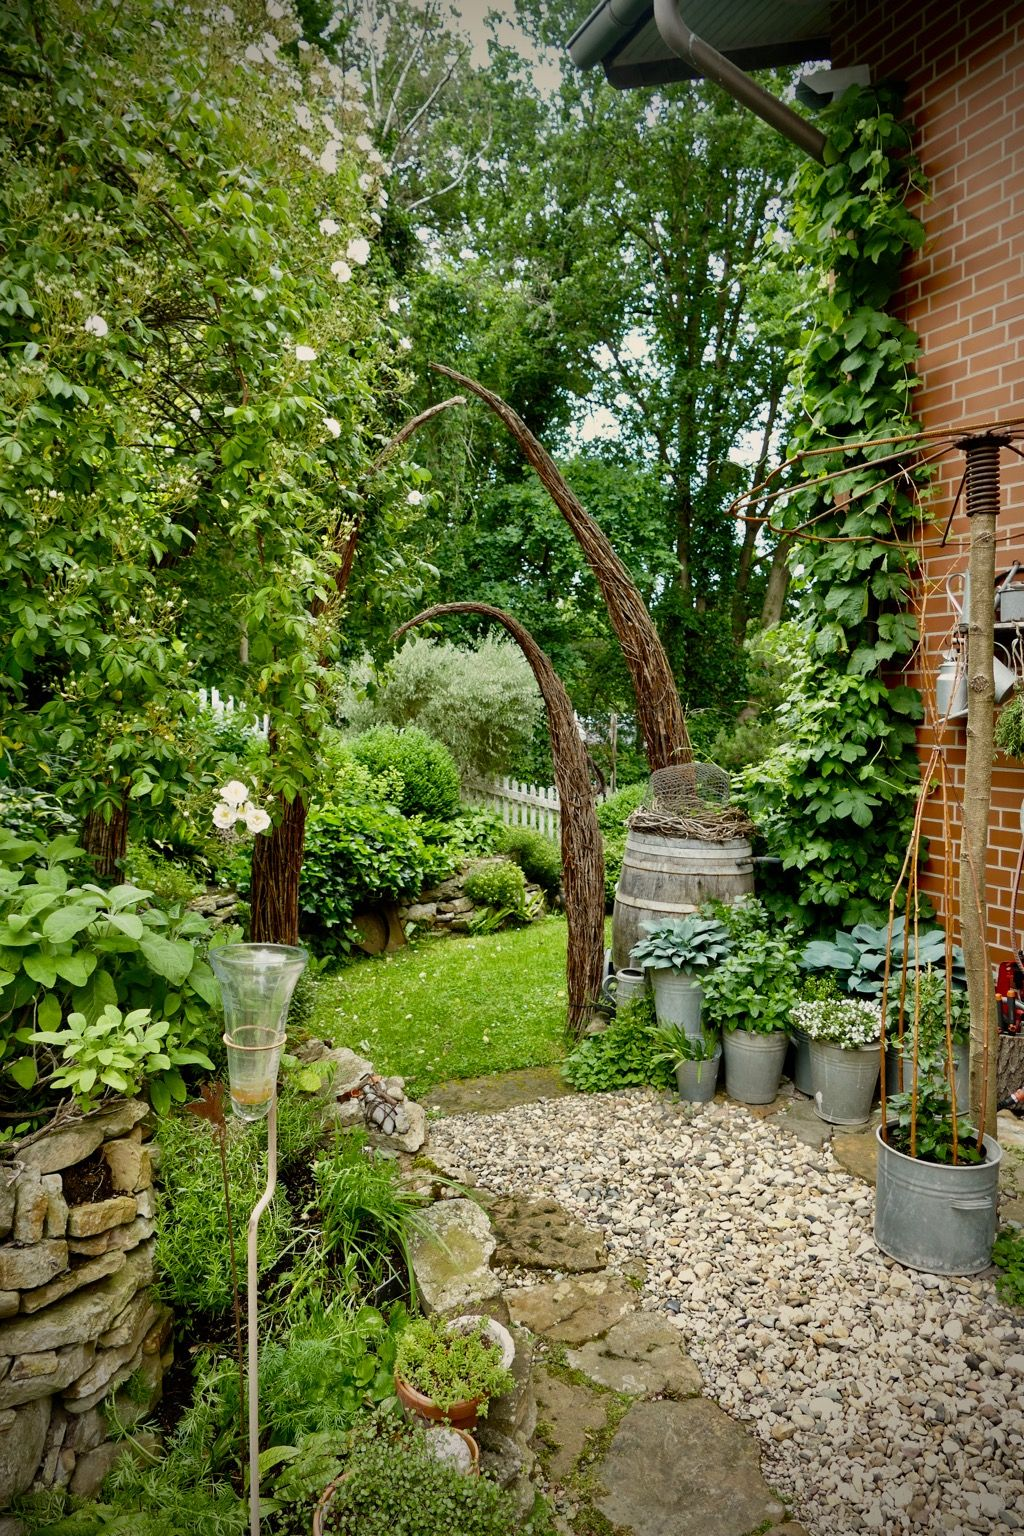 Garten Impressionen Im Juni Karin Urban Naturalstyle Garten Rustikaler Garten Naturgarten